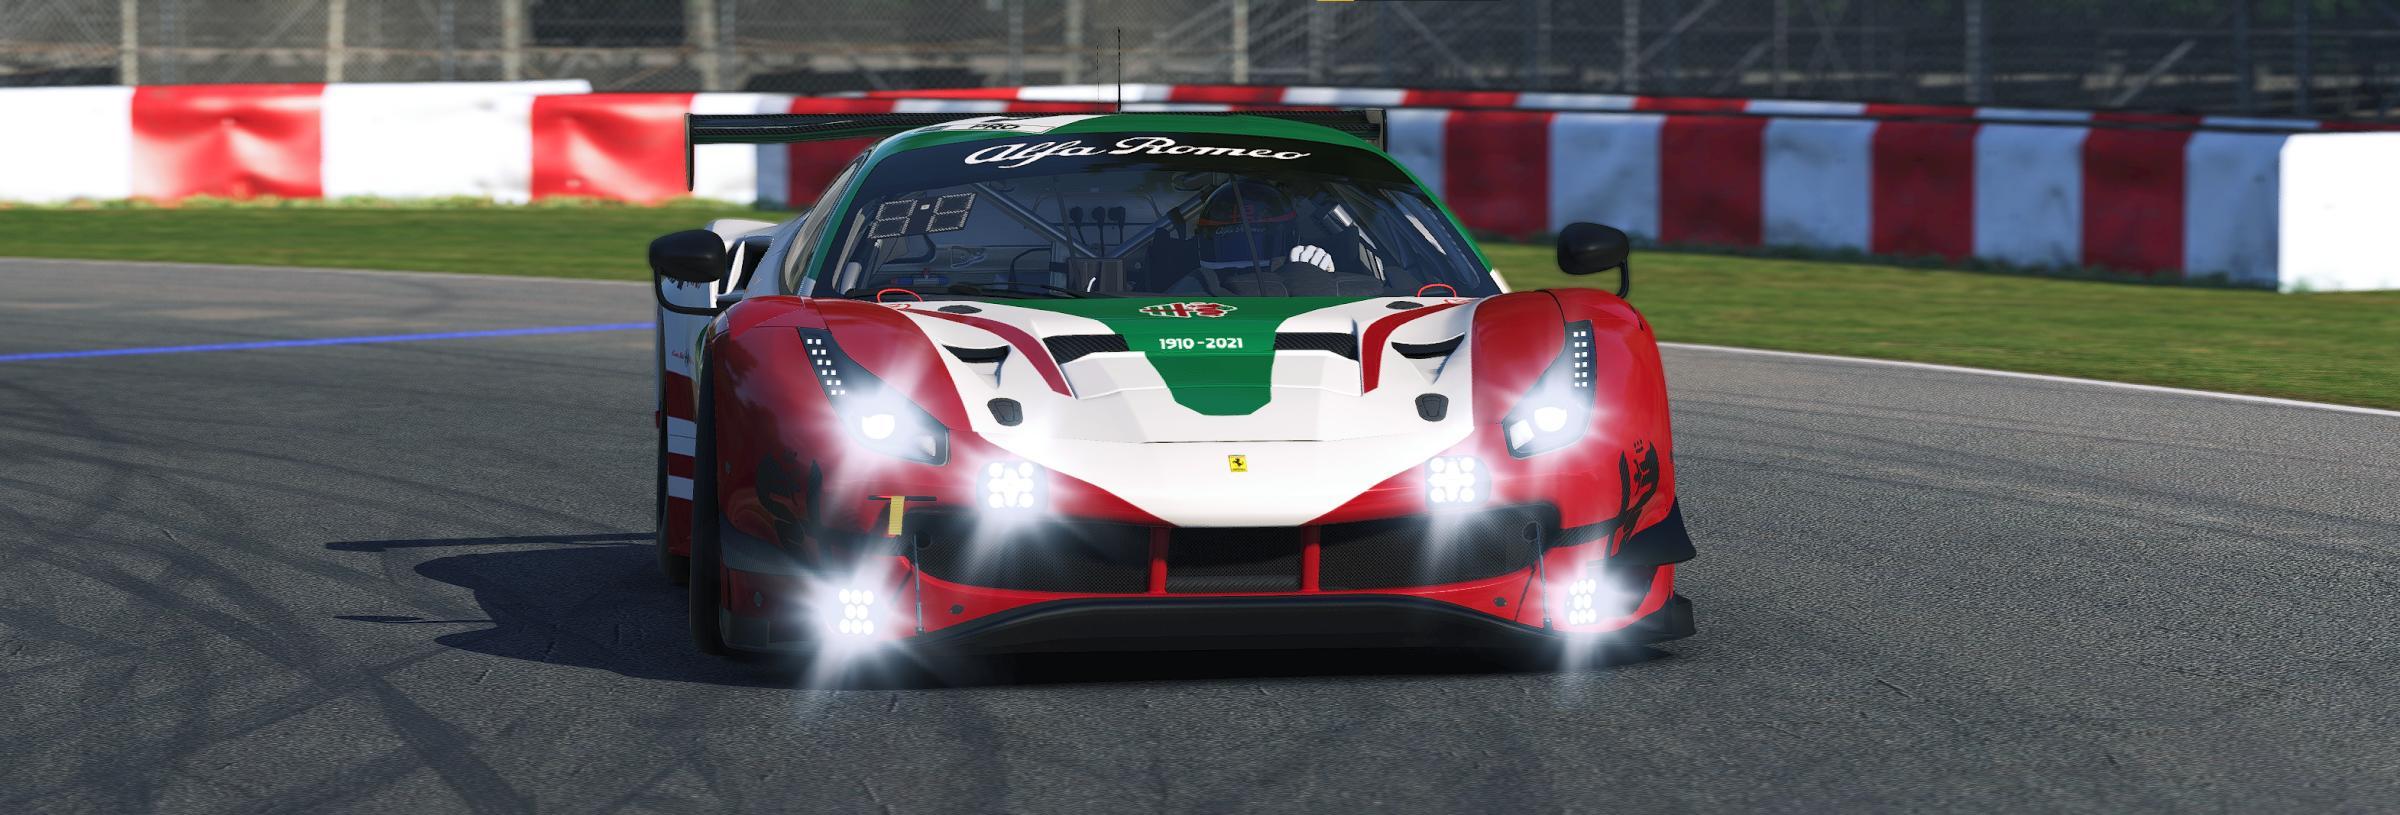 Preview of Alfa Romeo 111th Anniversary 488 GT3 Evo by Matthew A Tomelleri